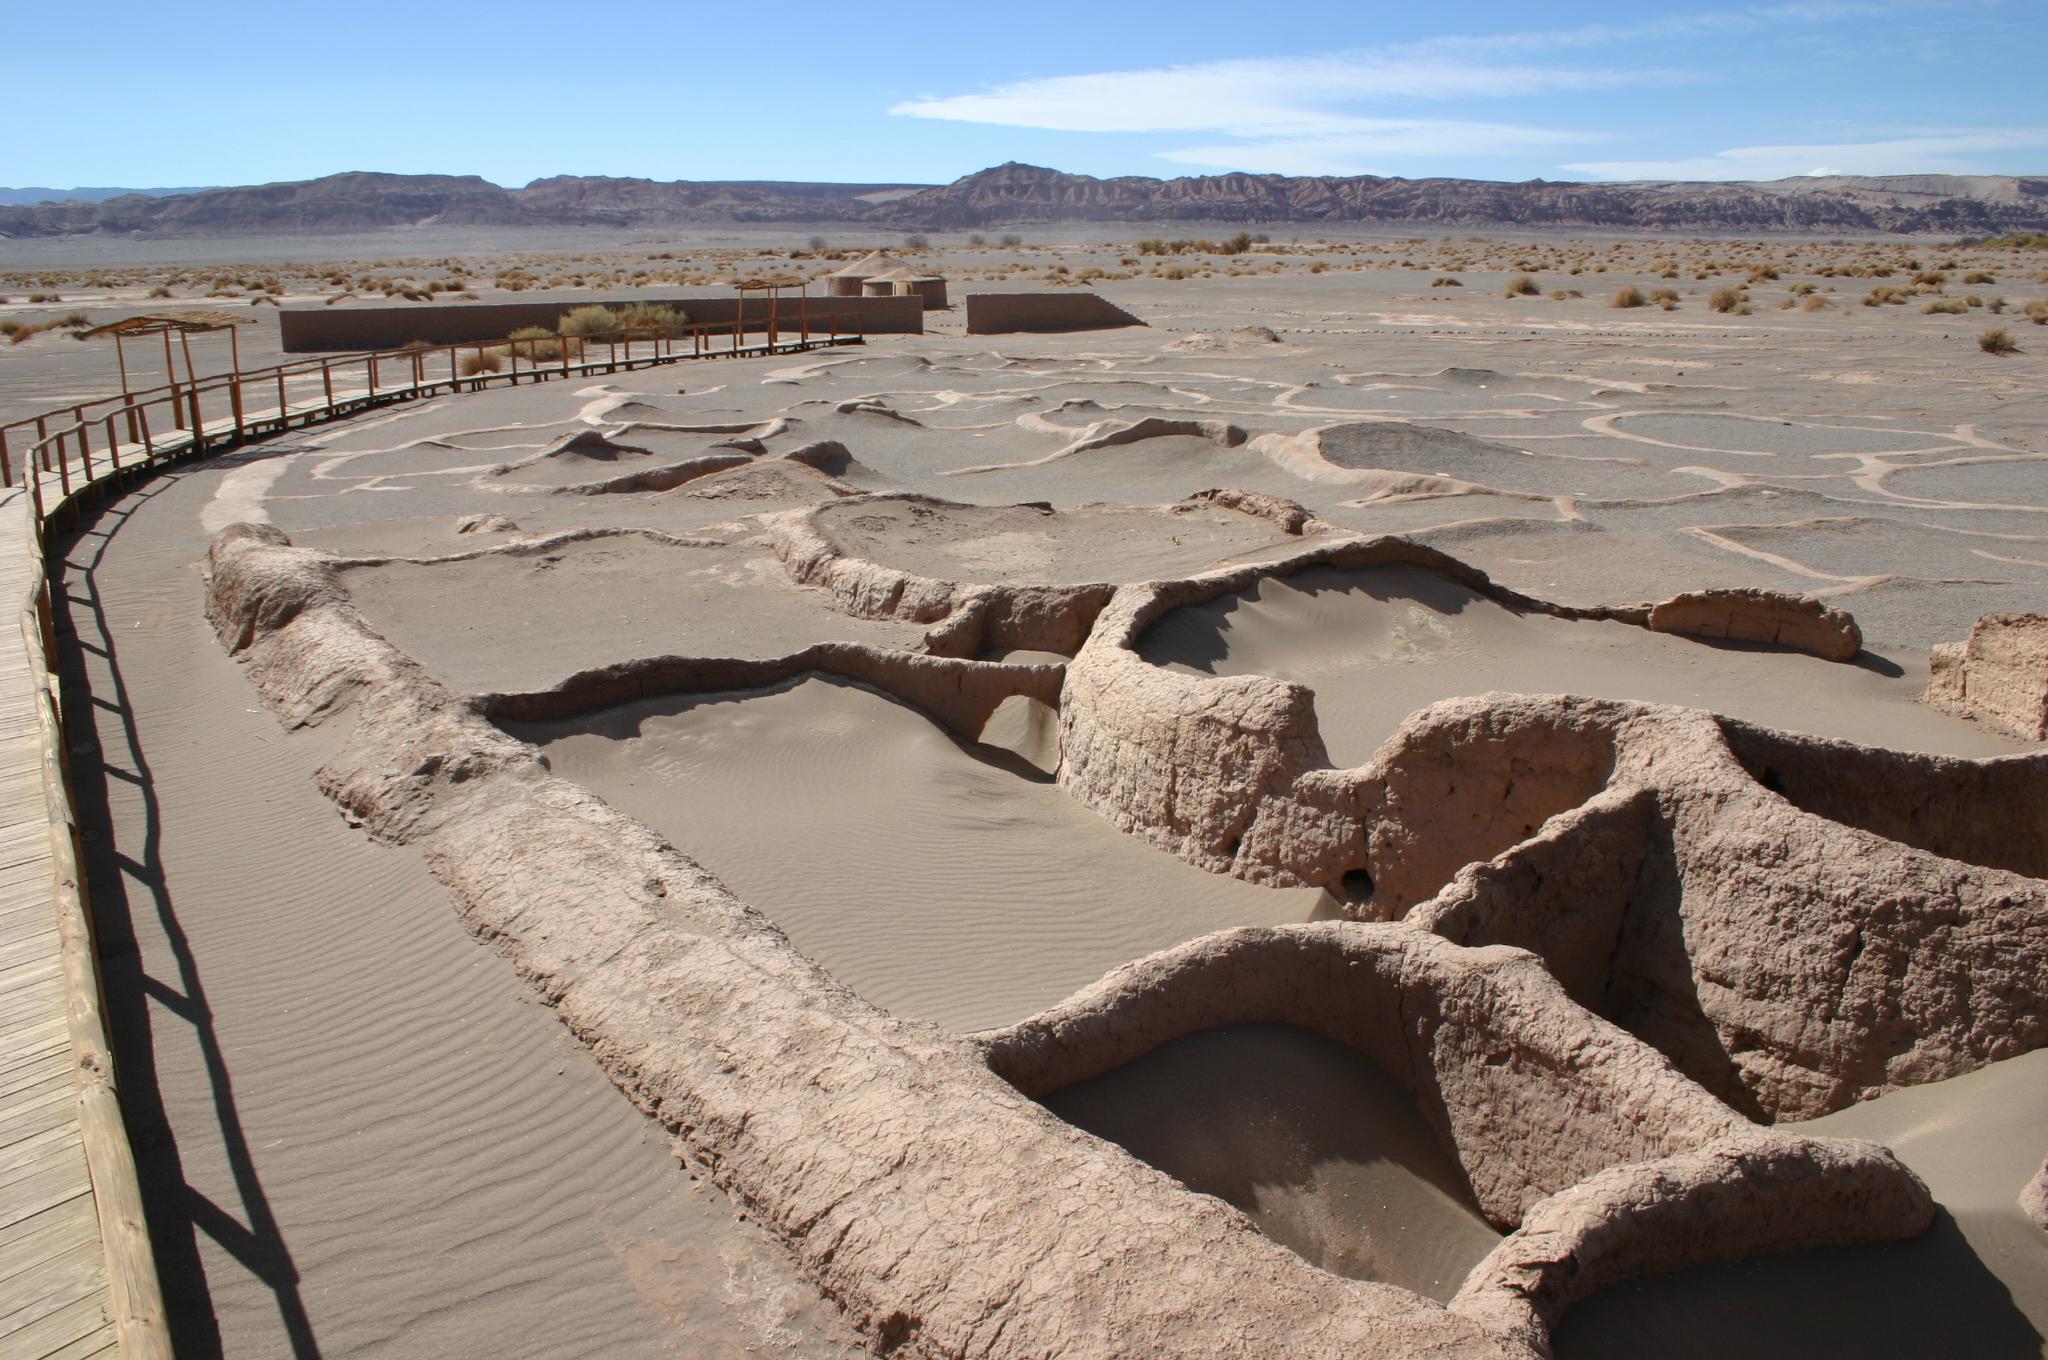 Archeological sites in Atacama